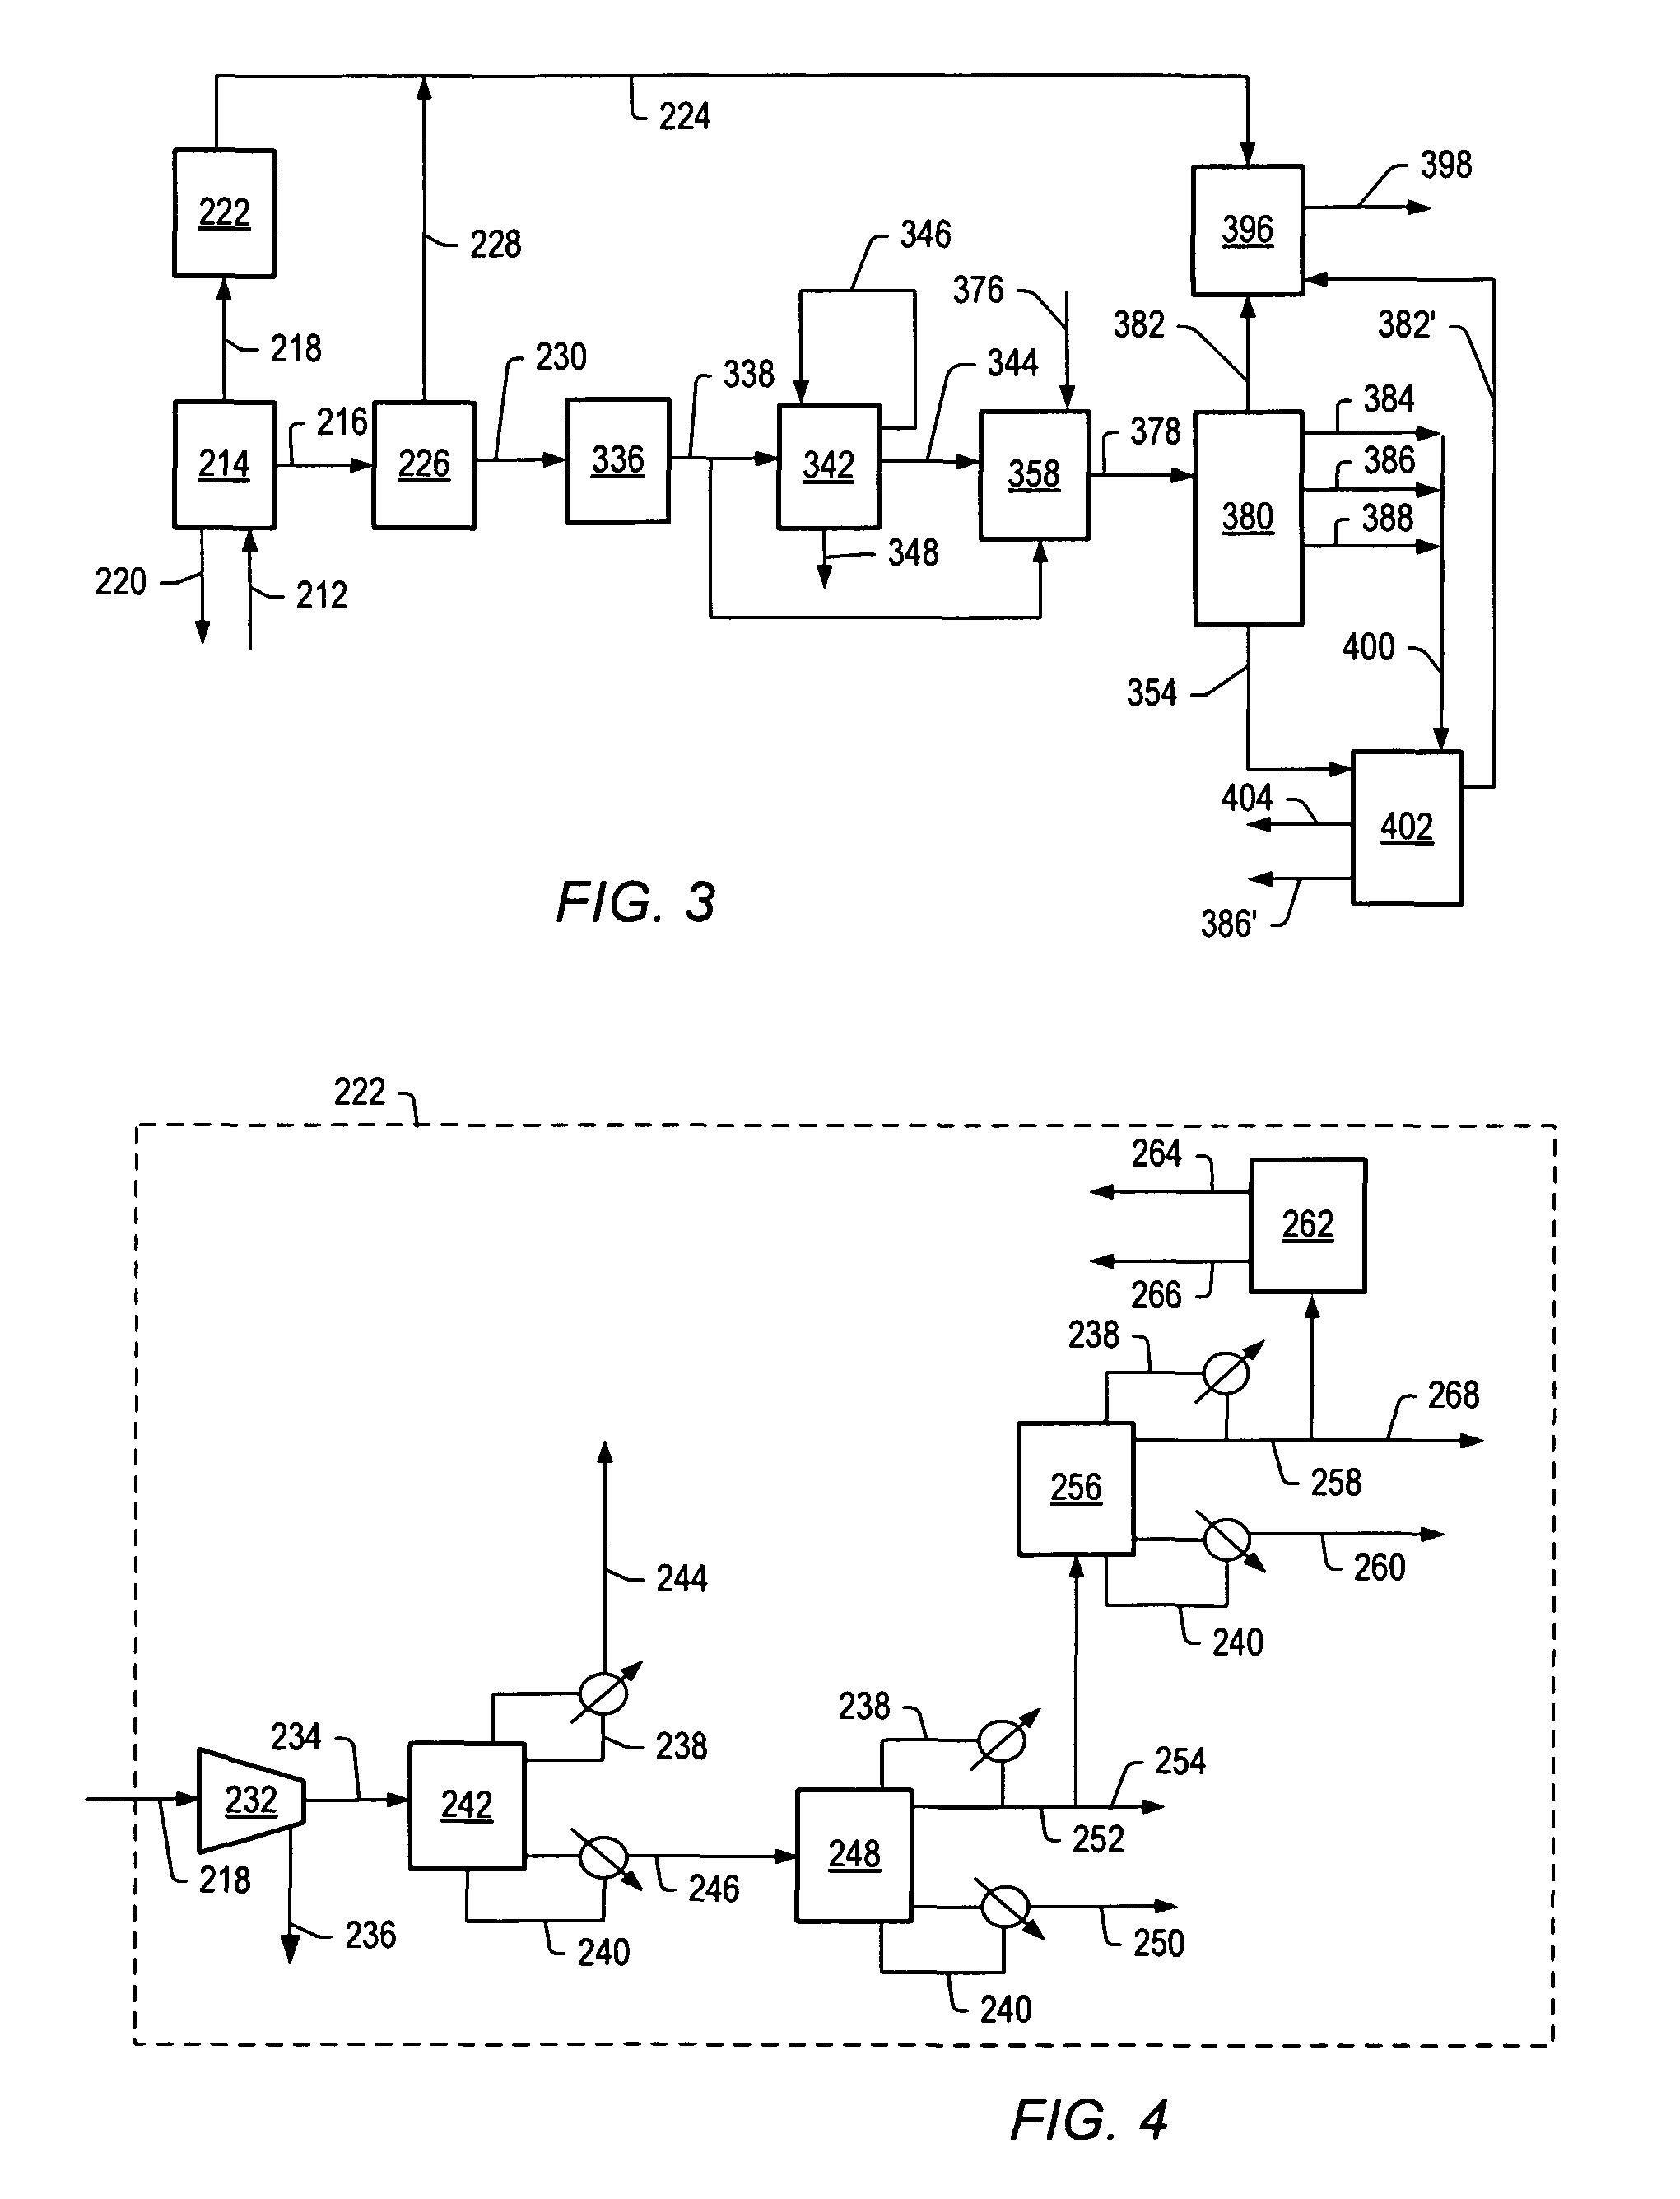 Patent US 8,791,396 B2 on